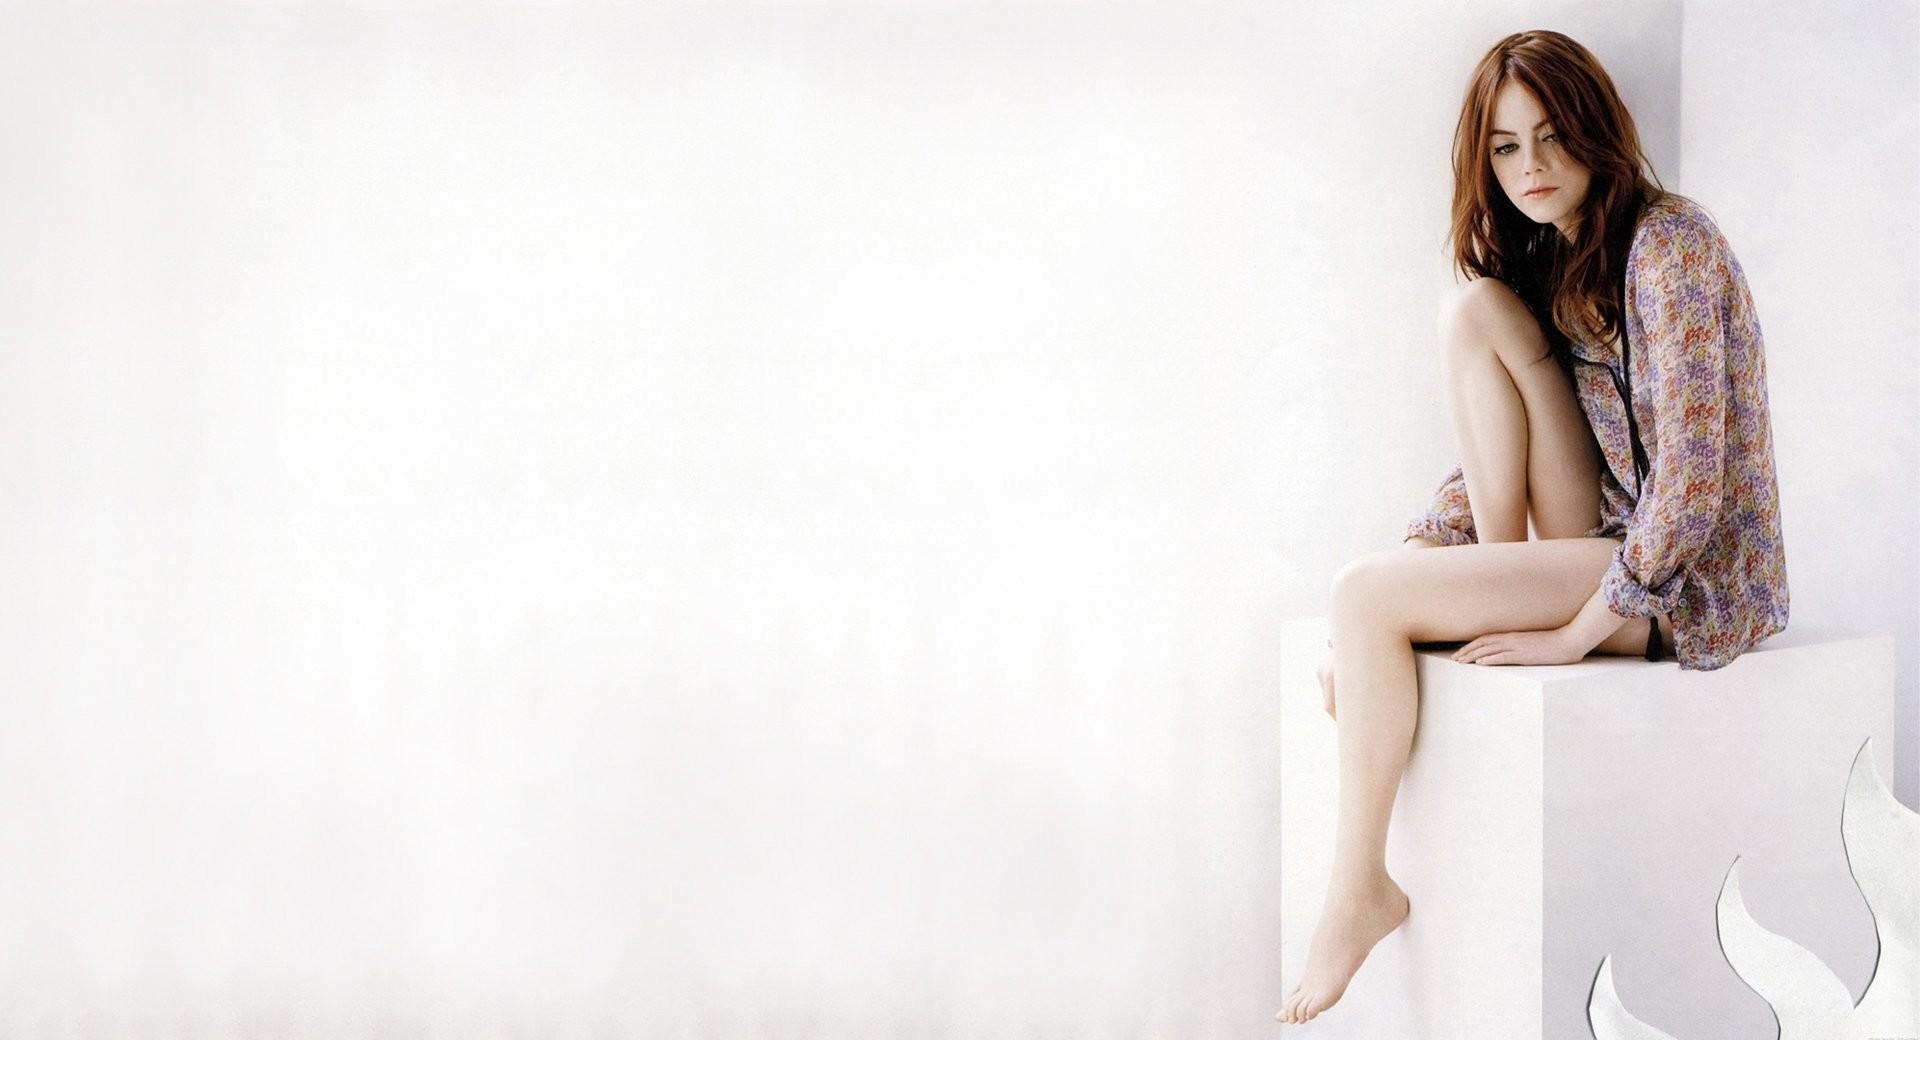 Celebrity – Emma Stone Wallpaper